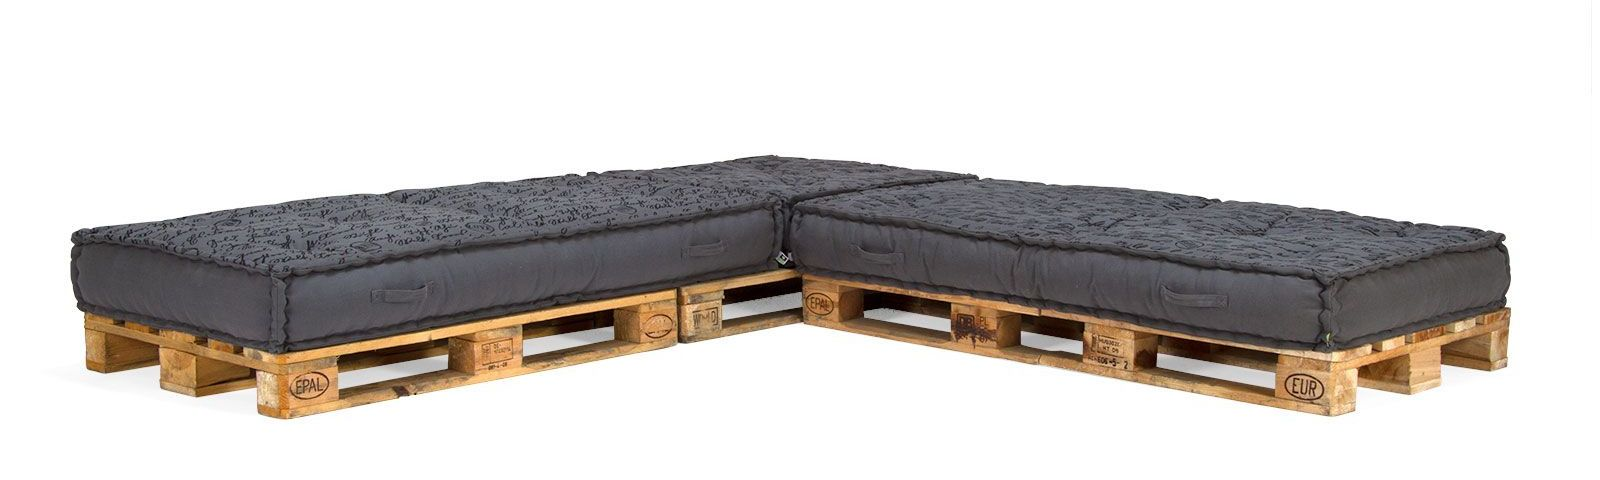 coussin palette ikea canap palettes. Black Bedroom Furniture Sets. Home Design Ideas